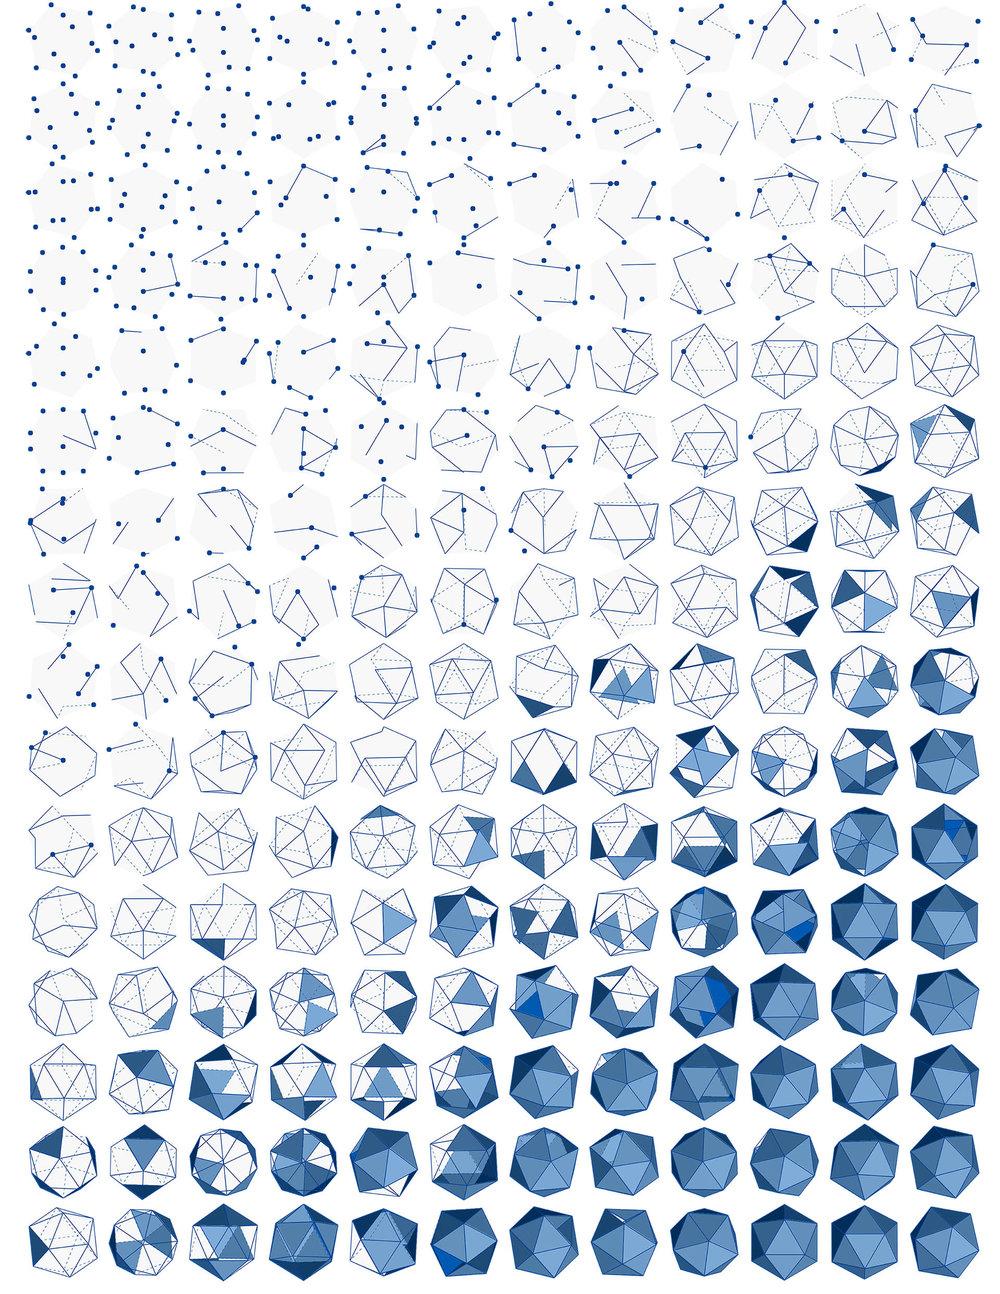 Geometry for Computational Design-01.jpg